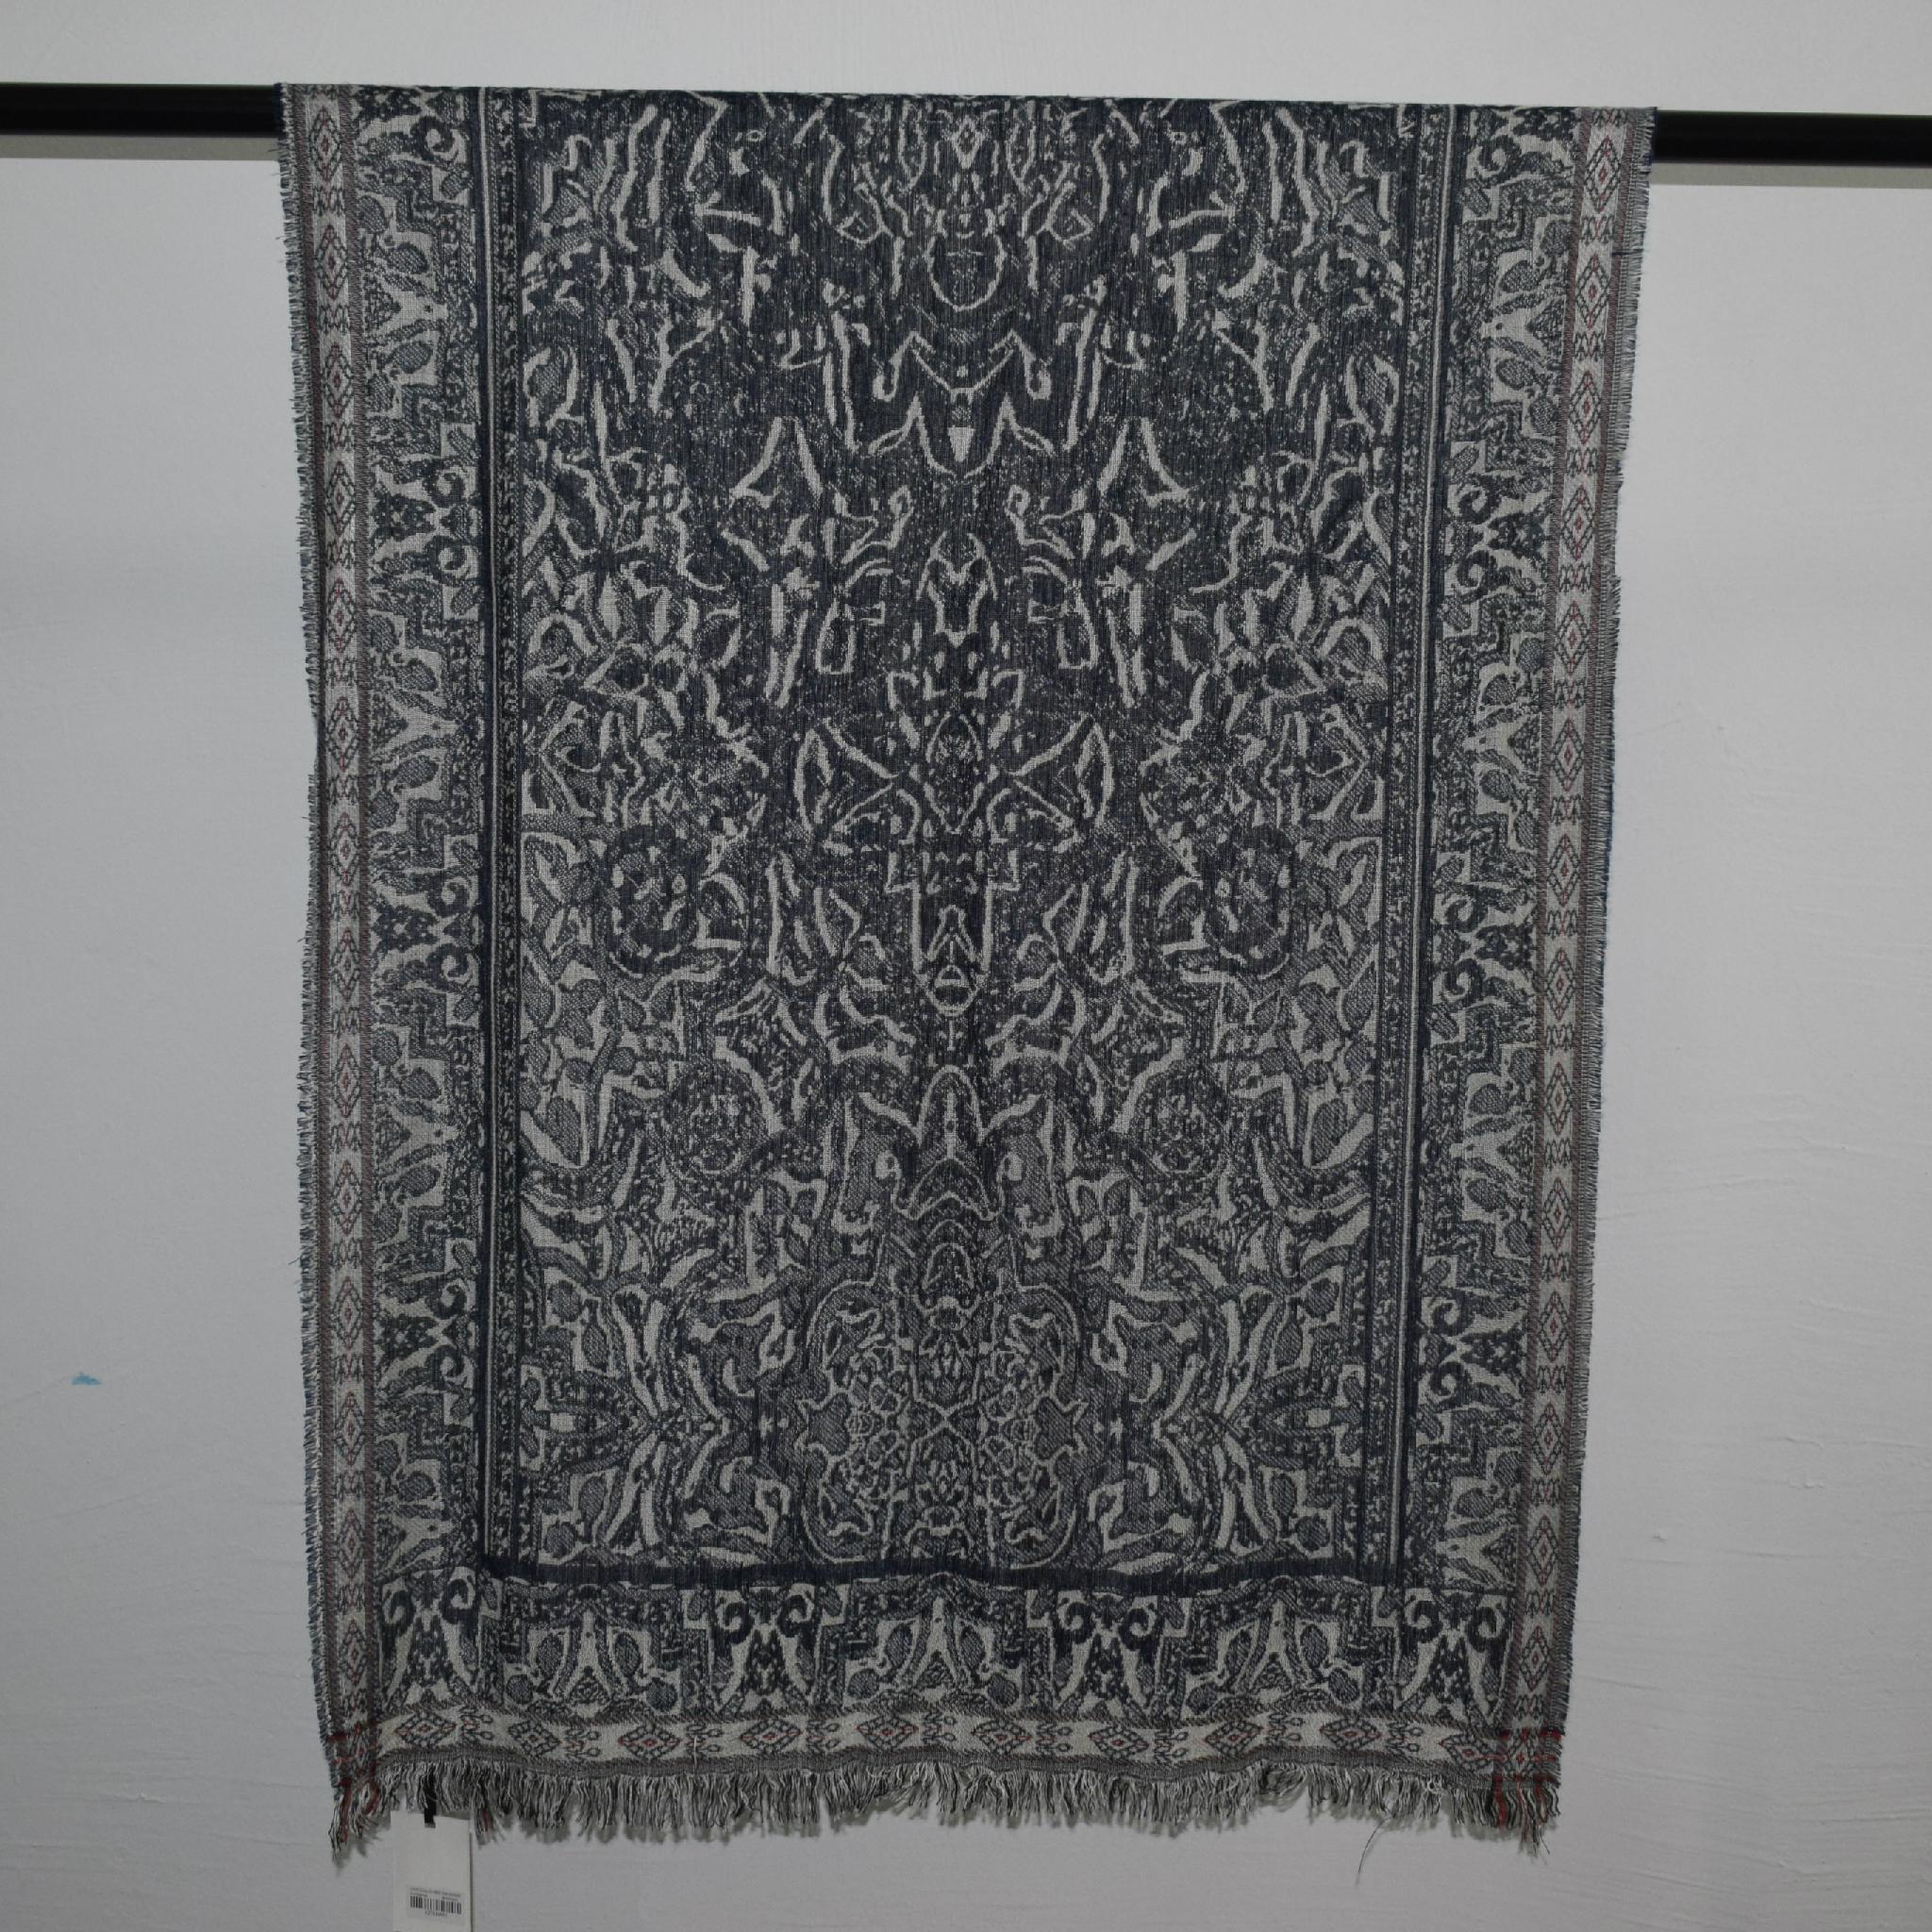 scarf圍巾加工定做批發誠信為本品質為尊    1